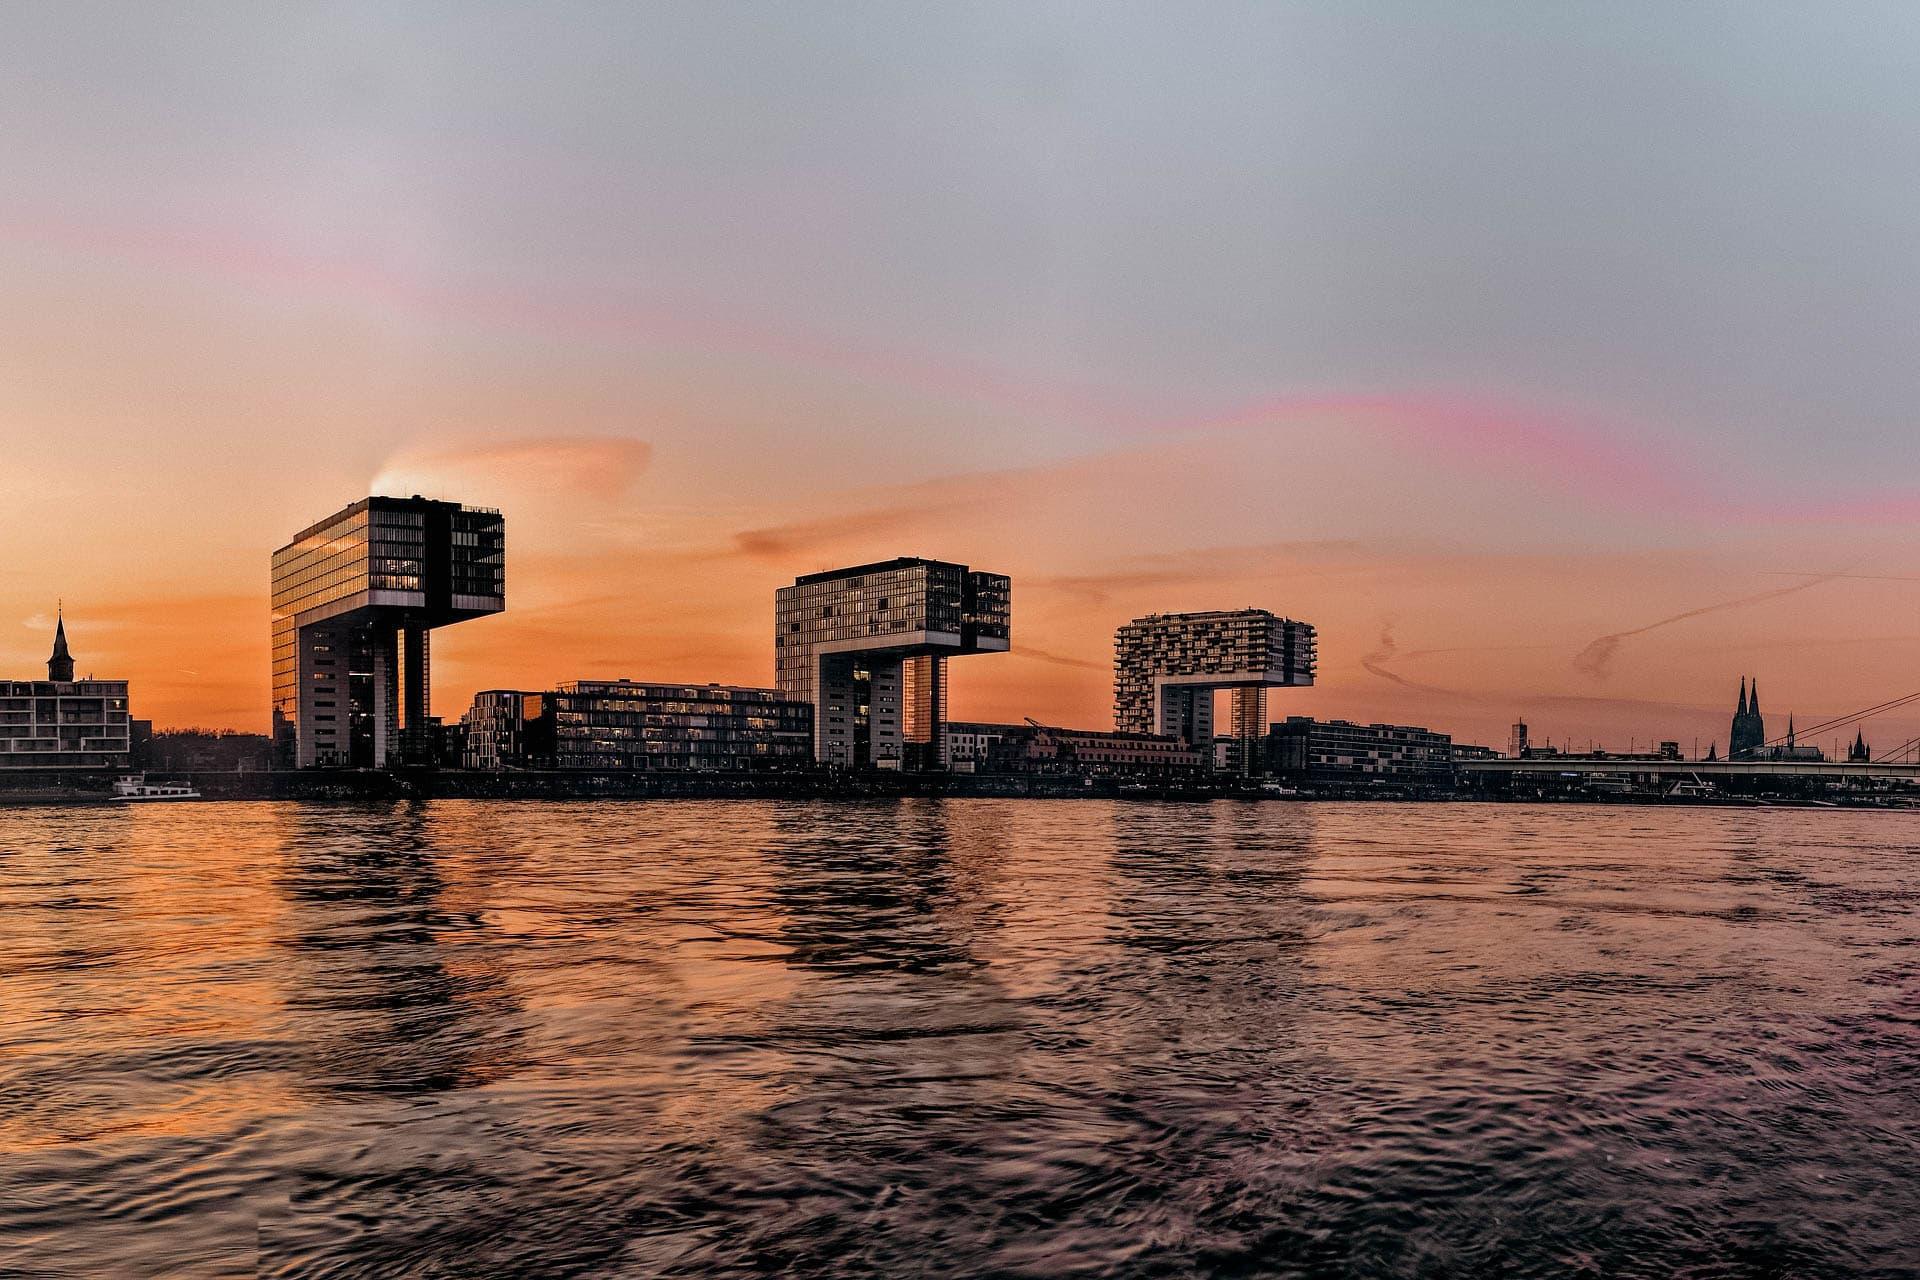 köln kranhäuser rheinauhafen sonnenuntergang